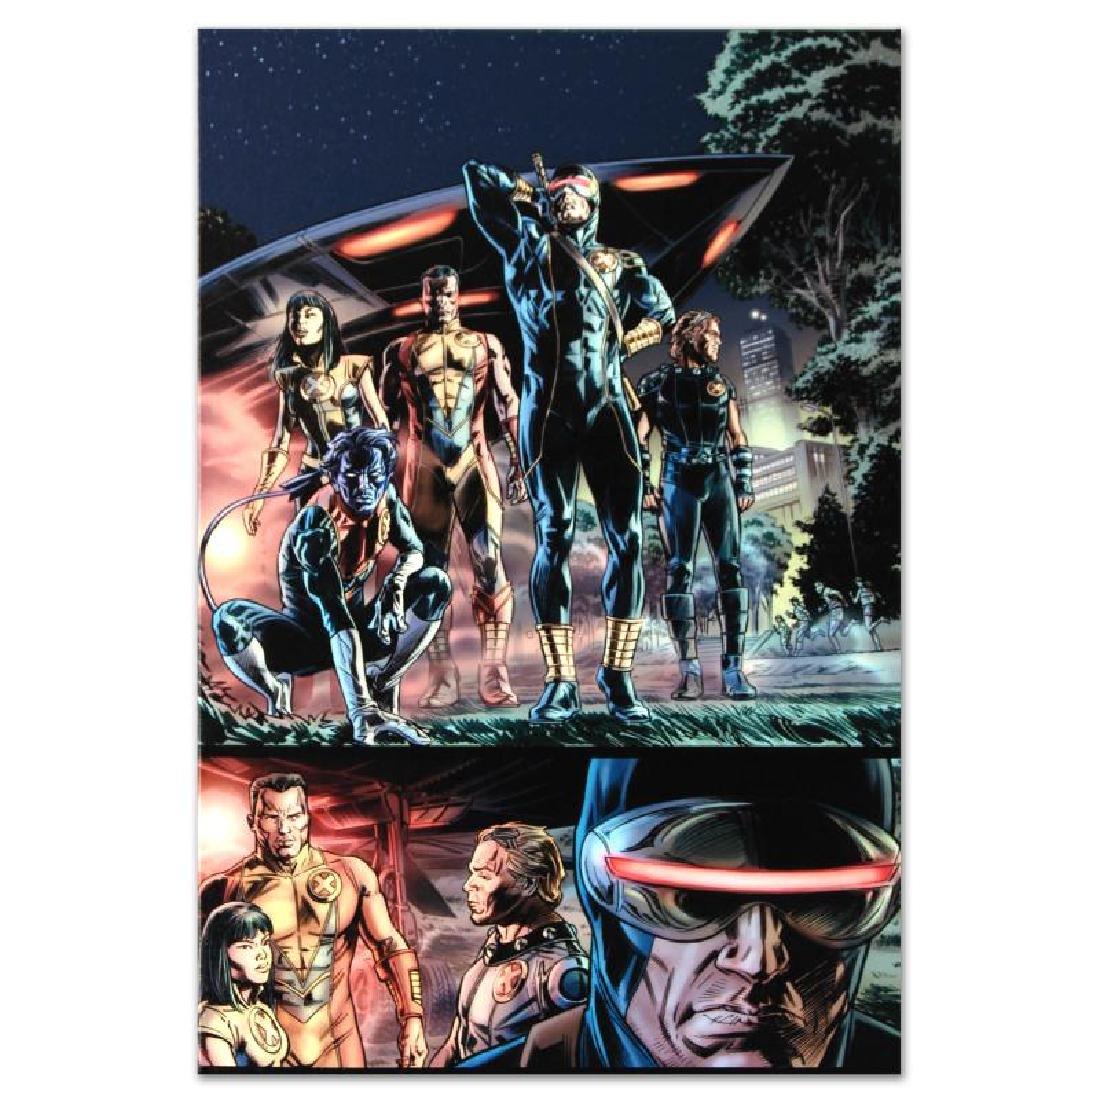 Wolverine: Origins #34 by Marvel Comics - 3